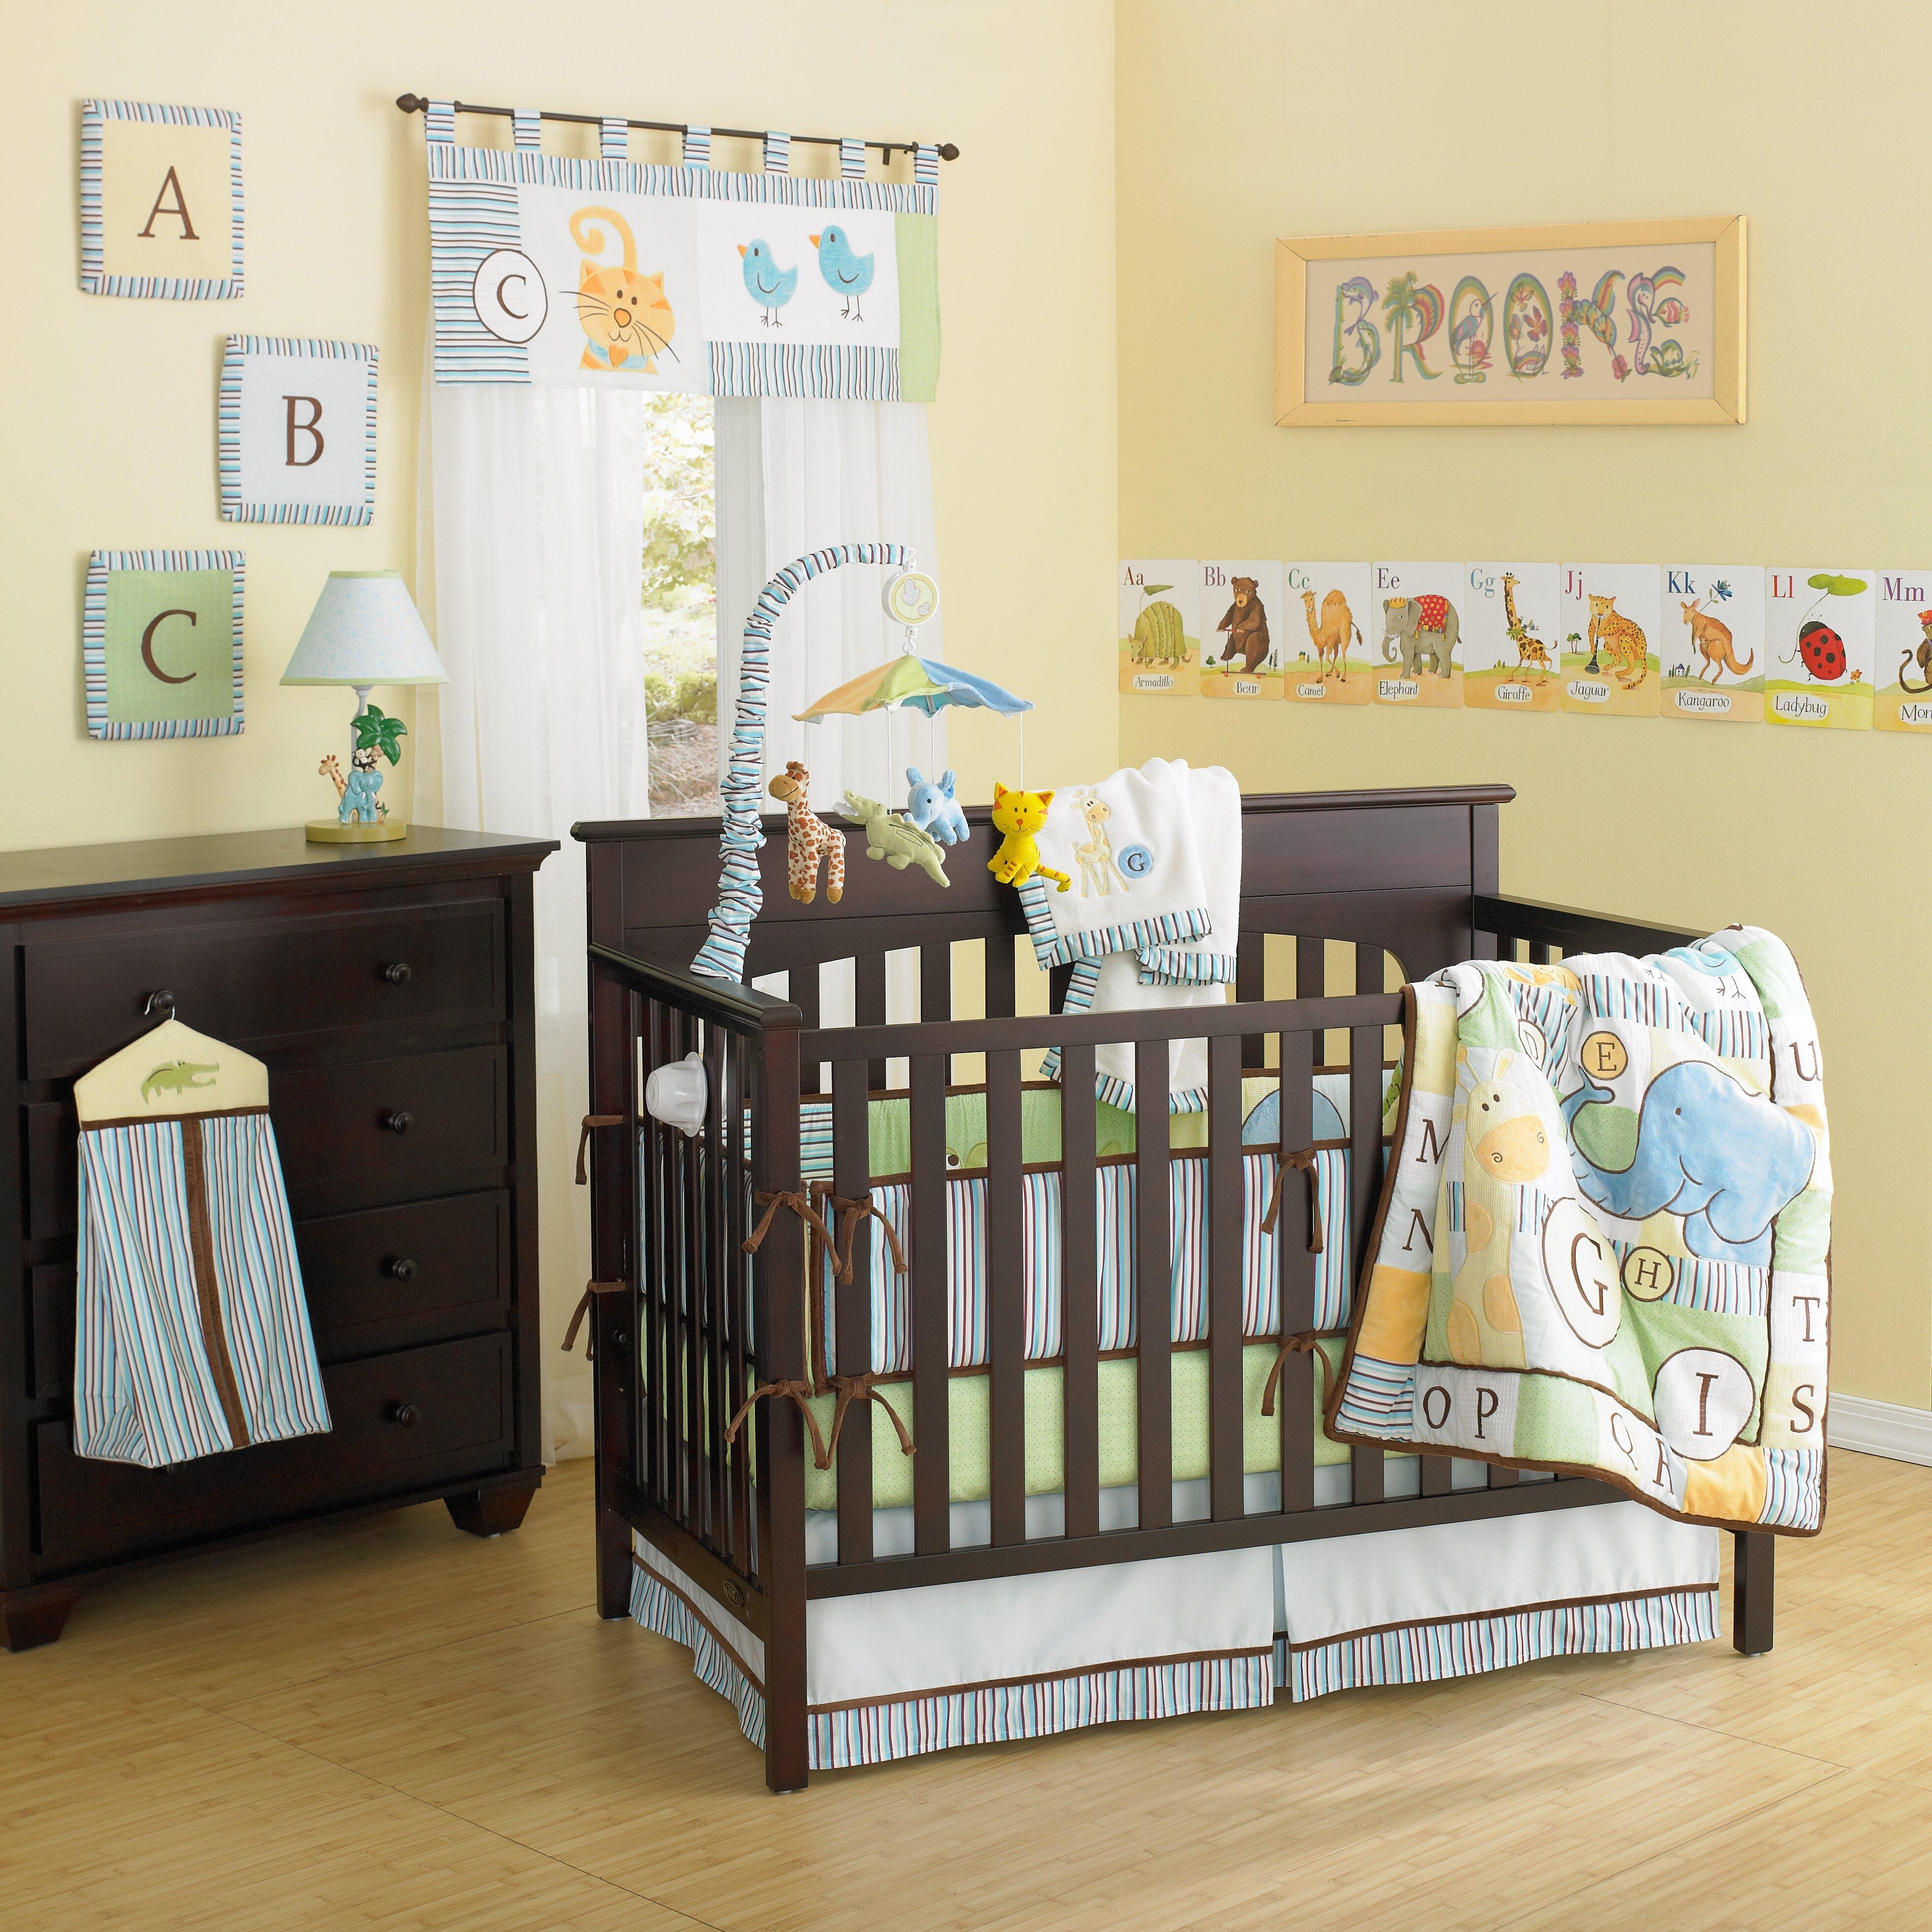 Baby crib zebra print bedding - Abc Animal Friends 10 Piece Crib Bedding Set